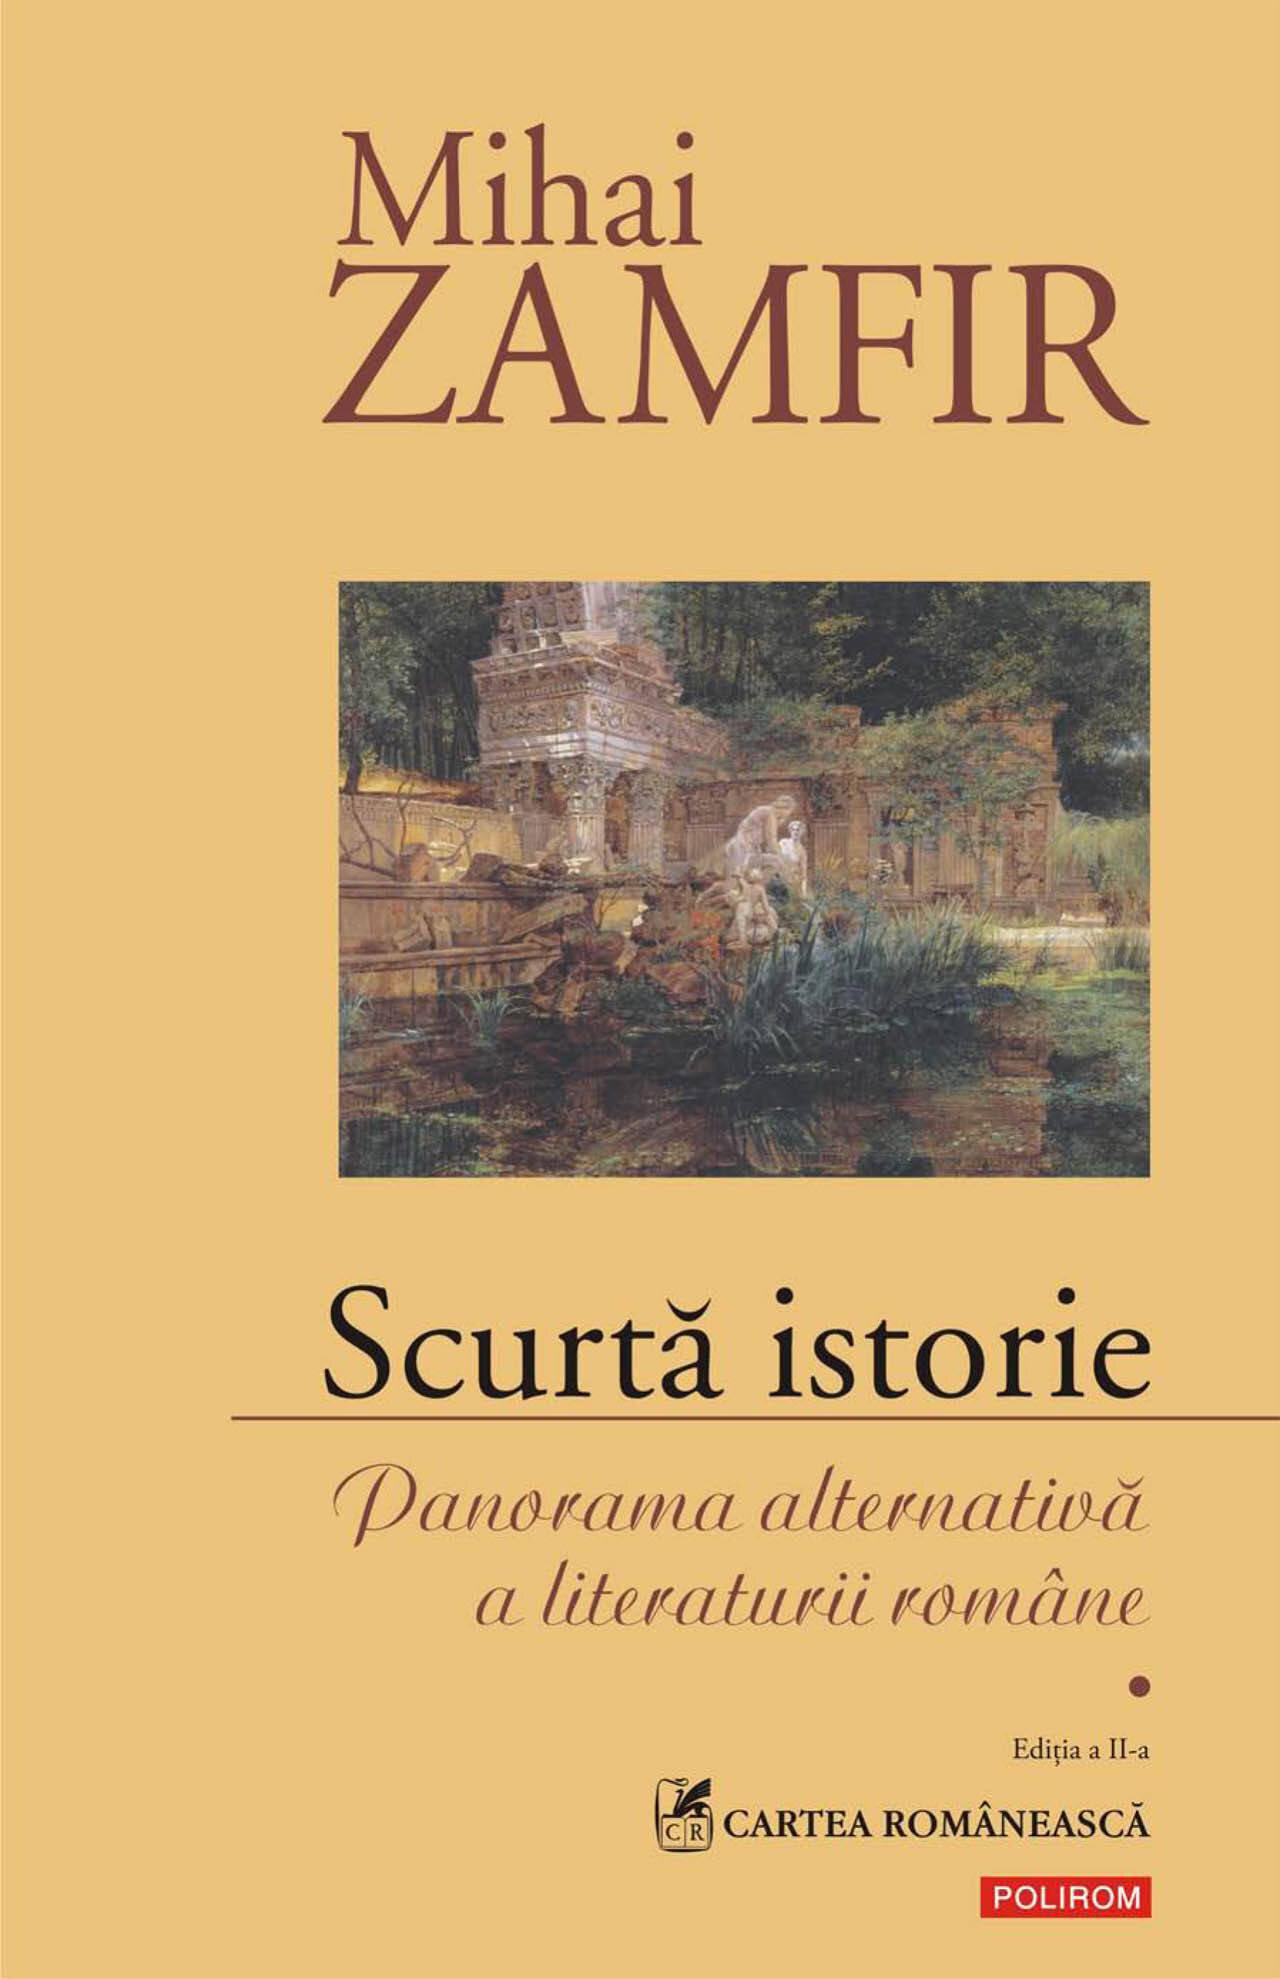 Scurta istorie. Panorama alternativa a literaturii romane. Volumul I (eBook)